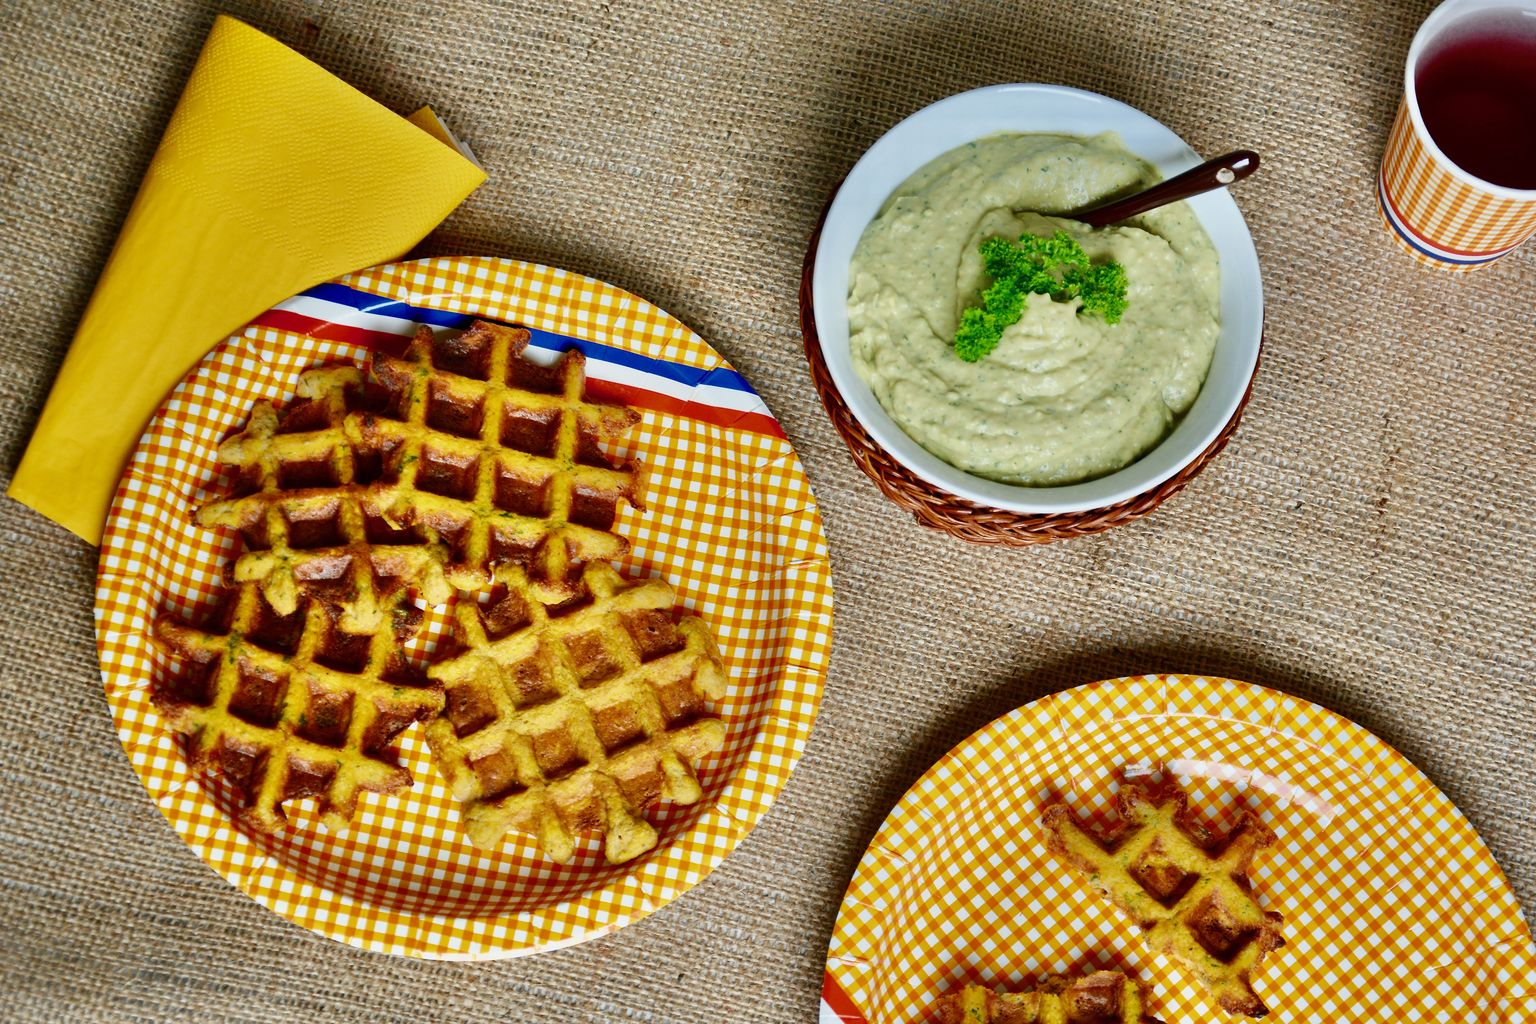 Sweet Potato Waffle with Avocado Dip